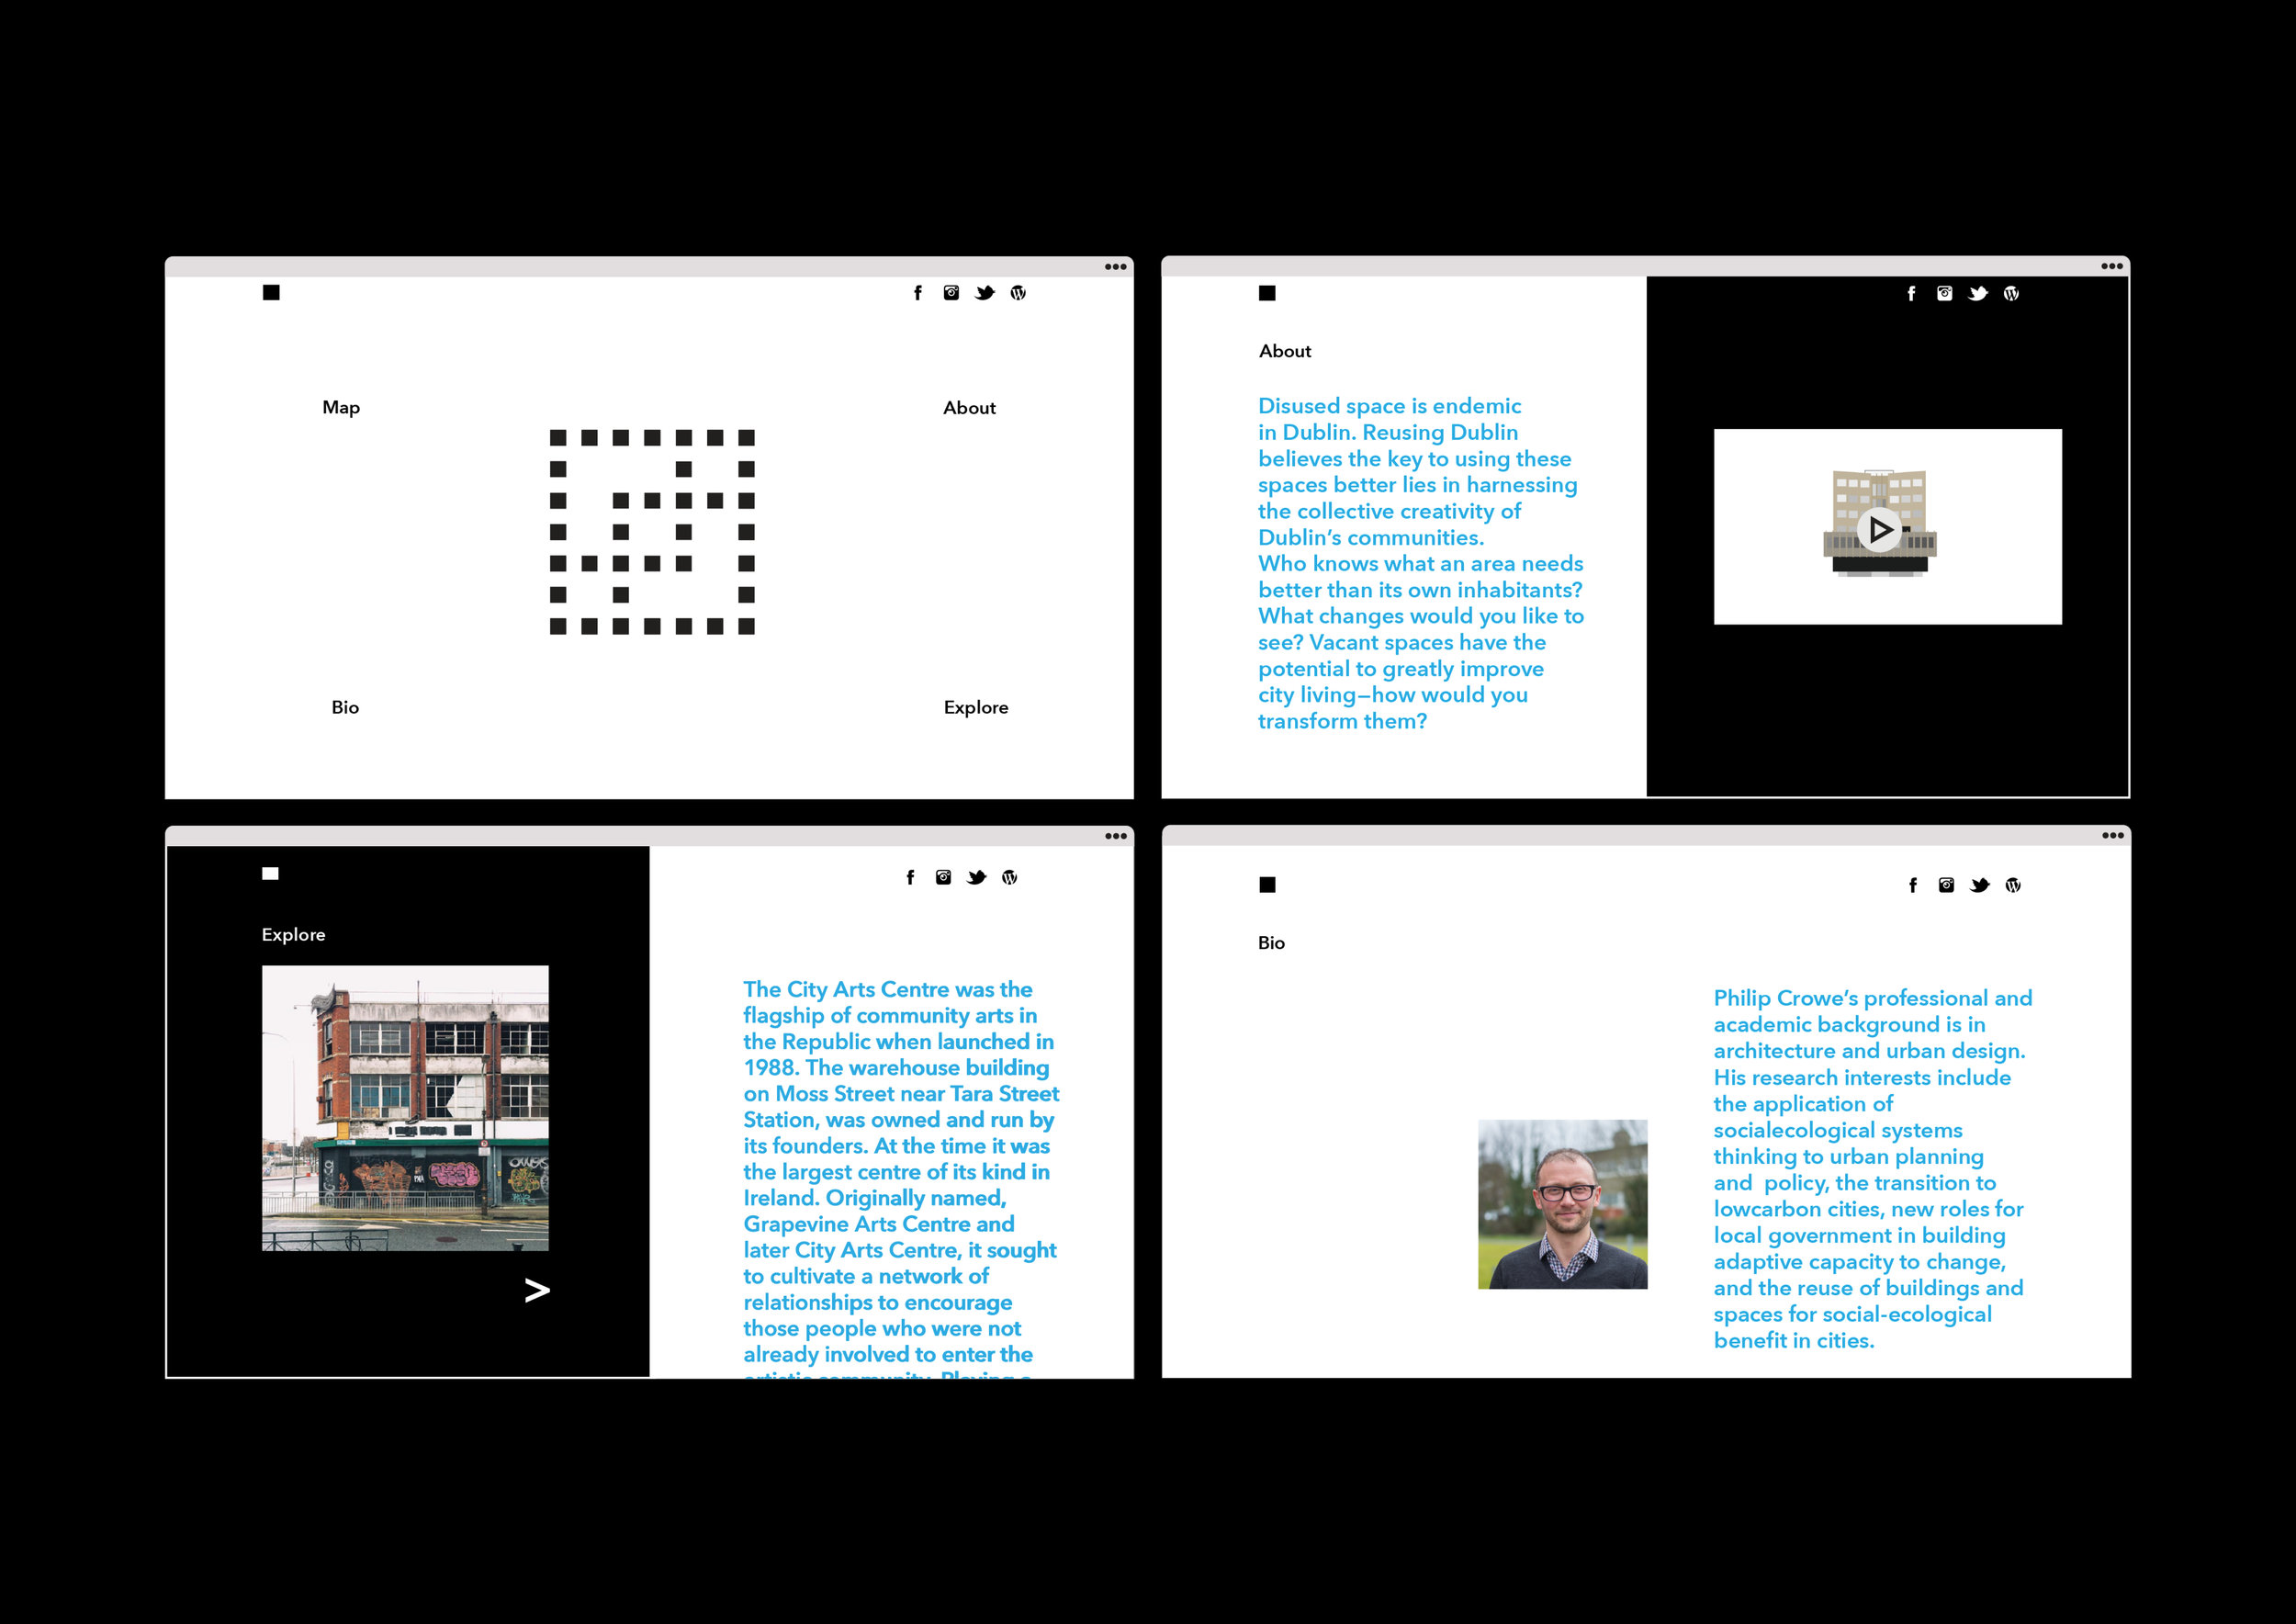 Eric Stynes Reusing Dublin Web